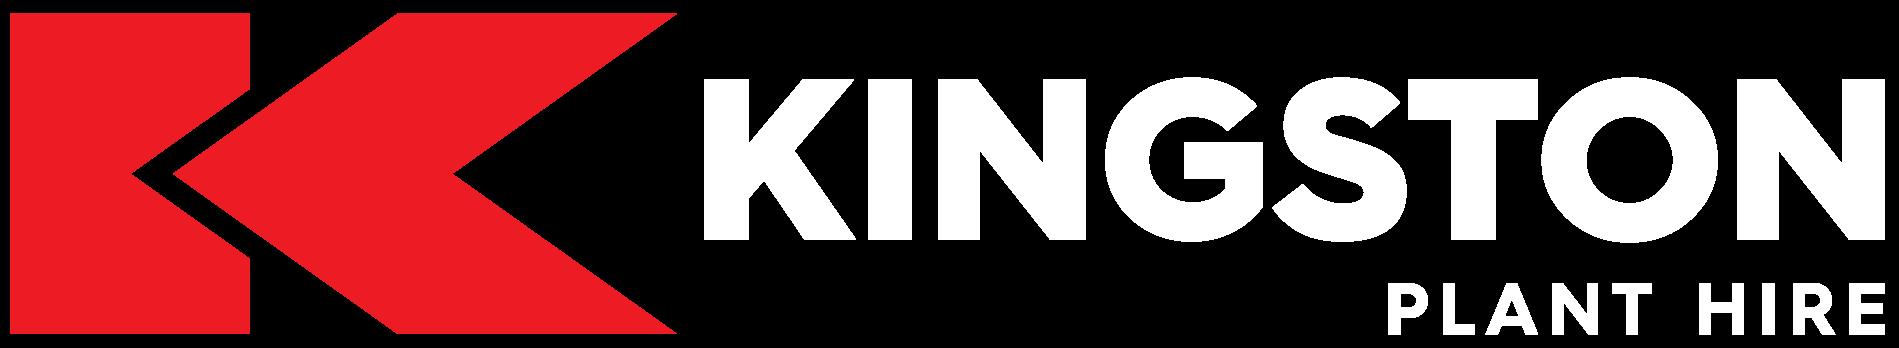 KINGSTON-PLANT-HIRE_Full-Logo_Red-White_L.png